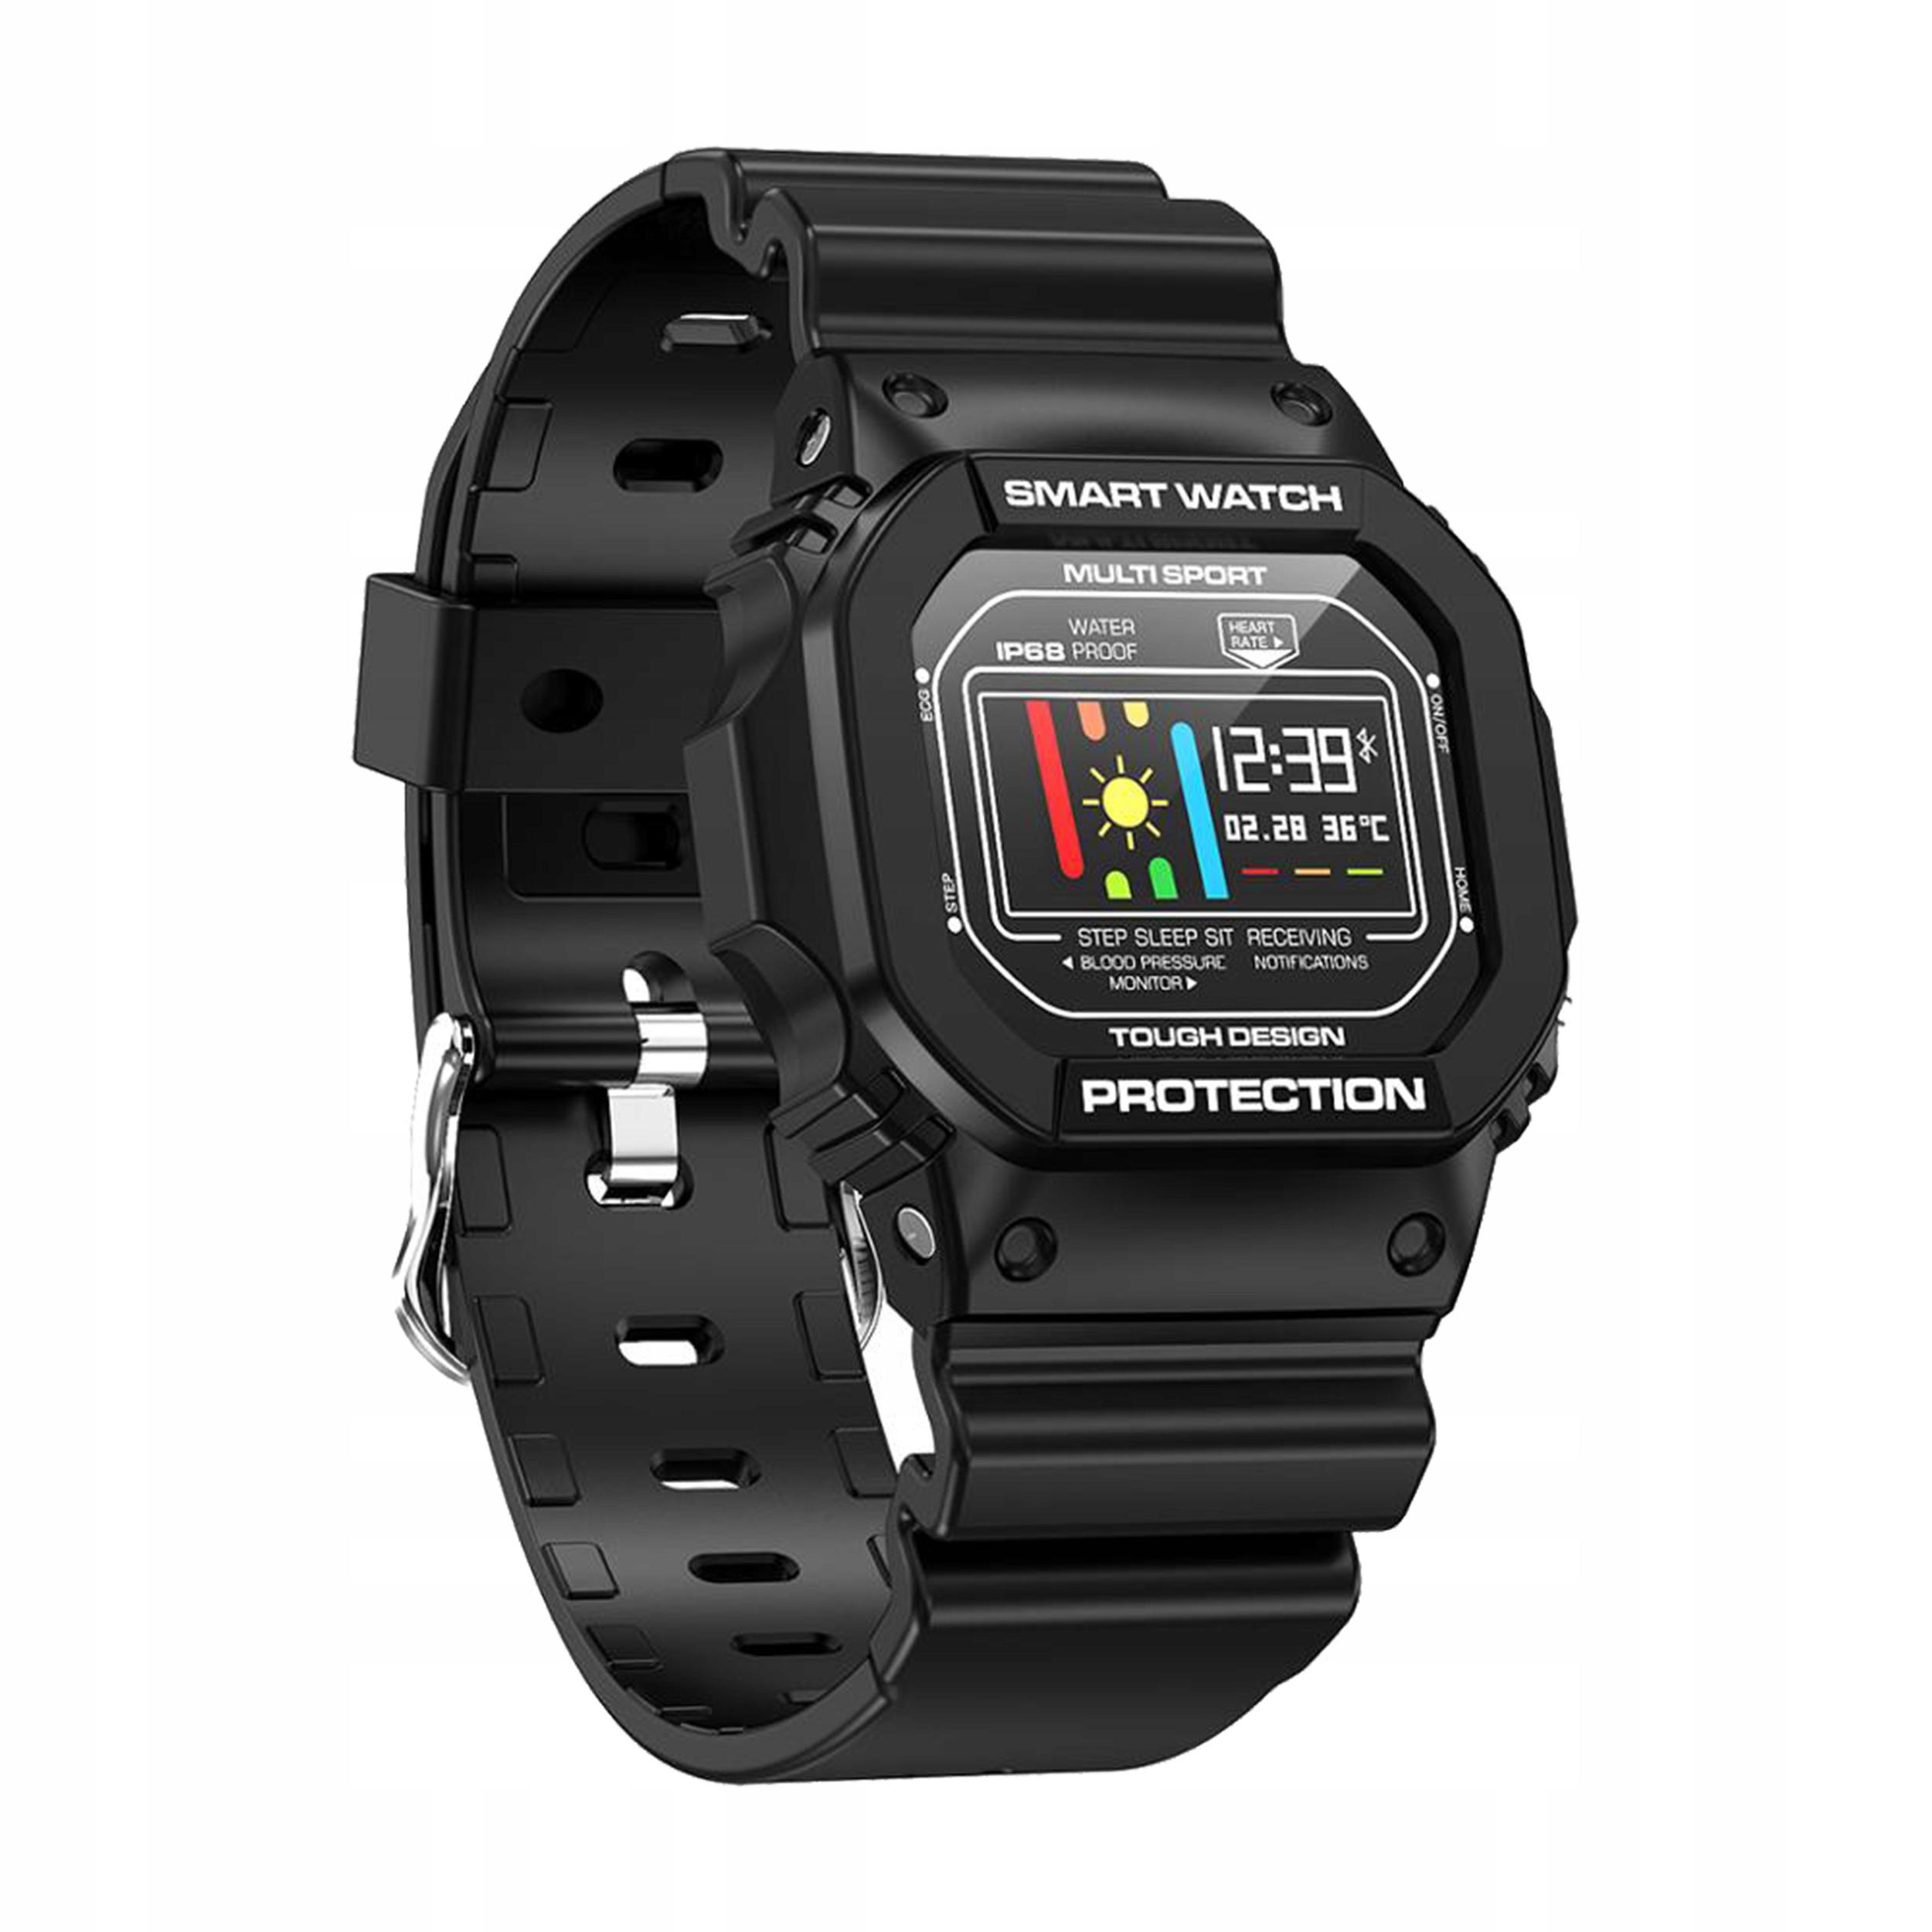 Smartwatch X12 RETRO Dizajn Smartband Krokomer